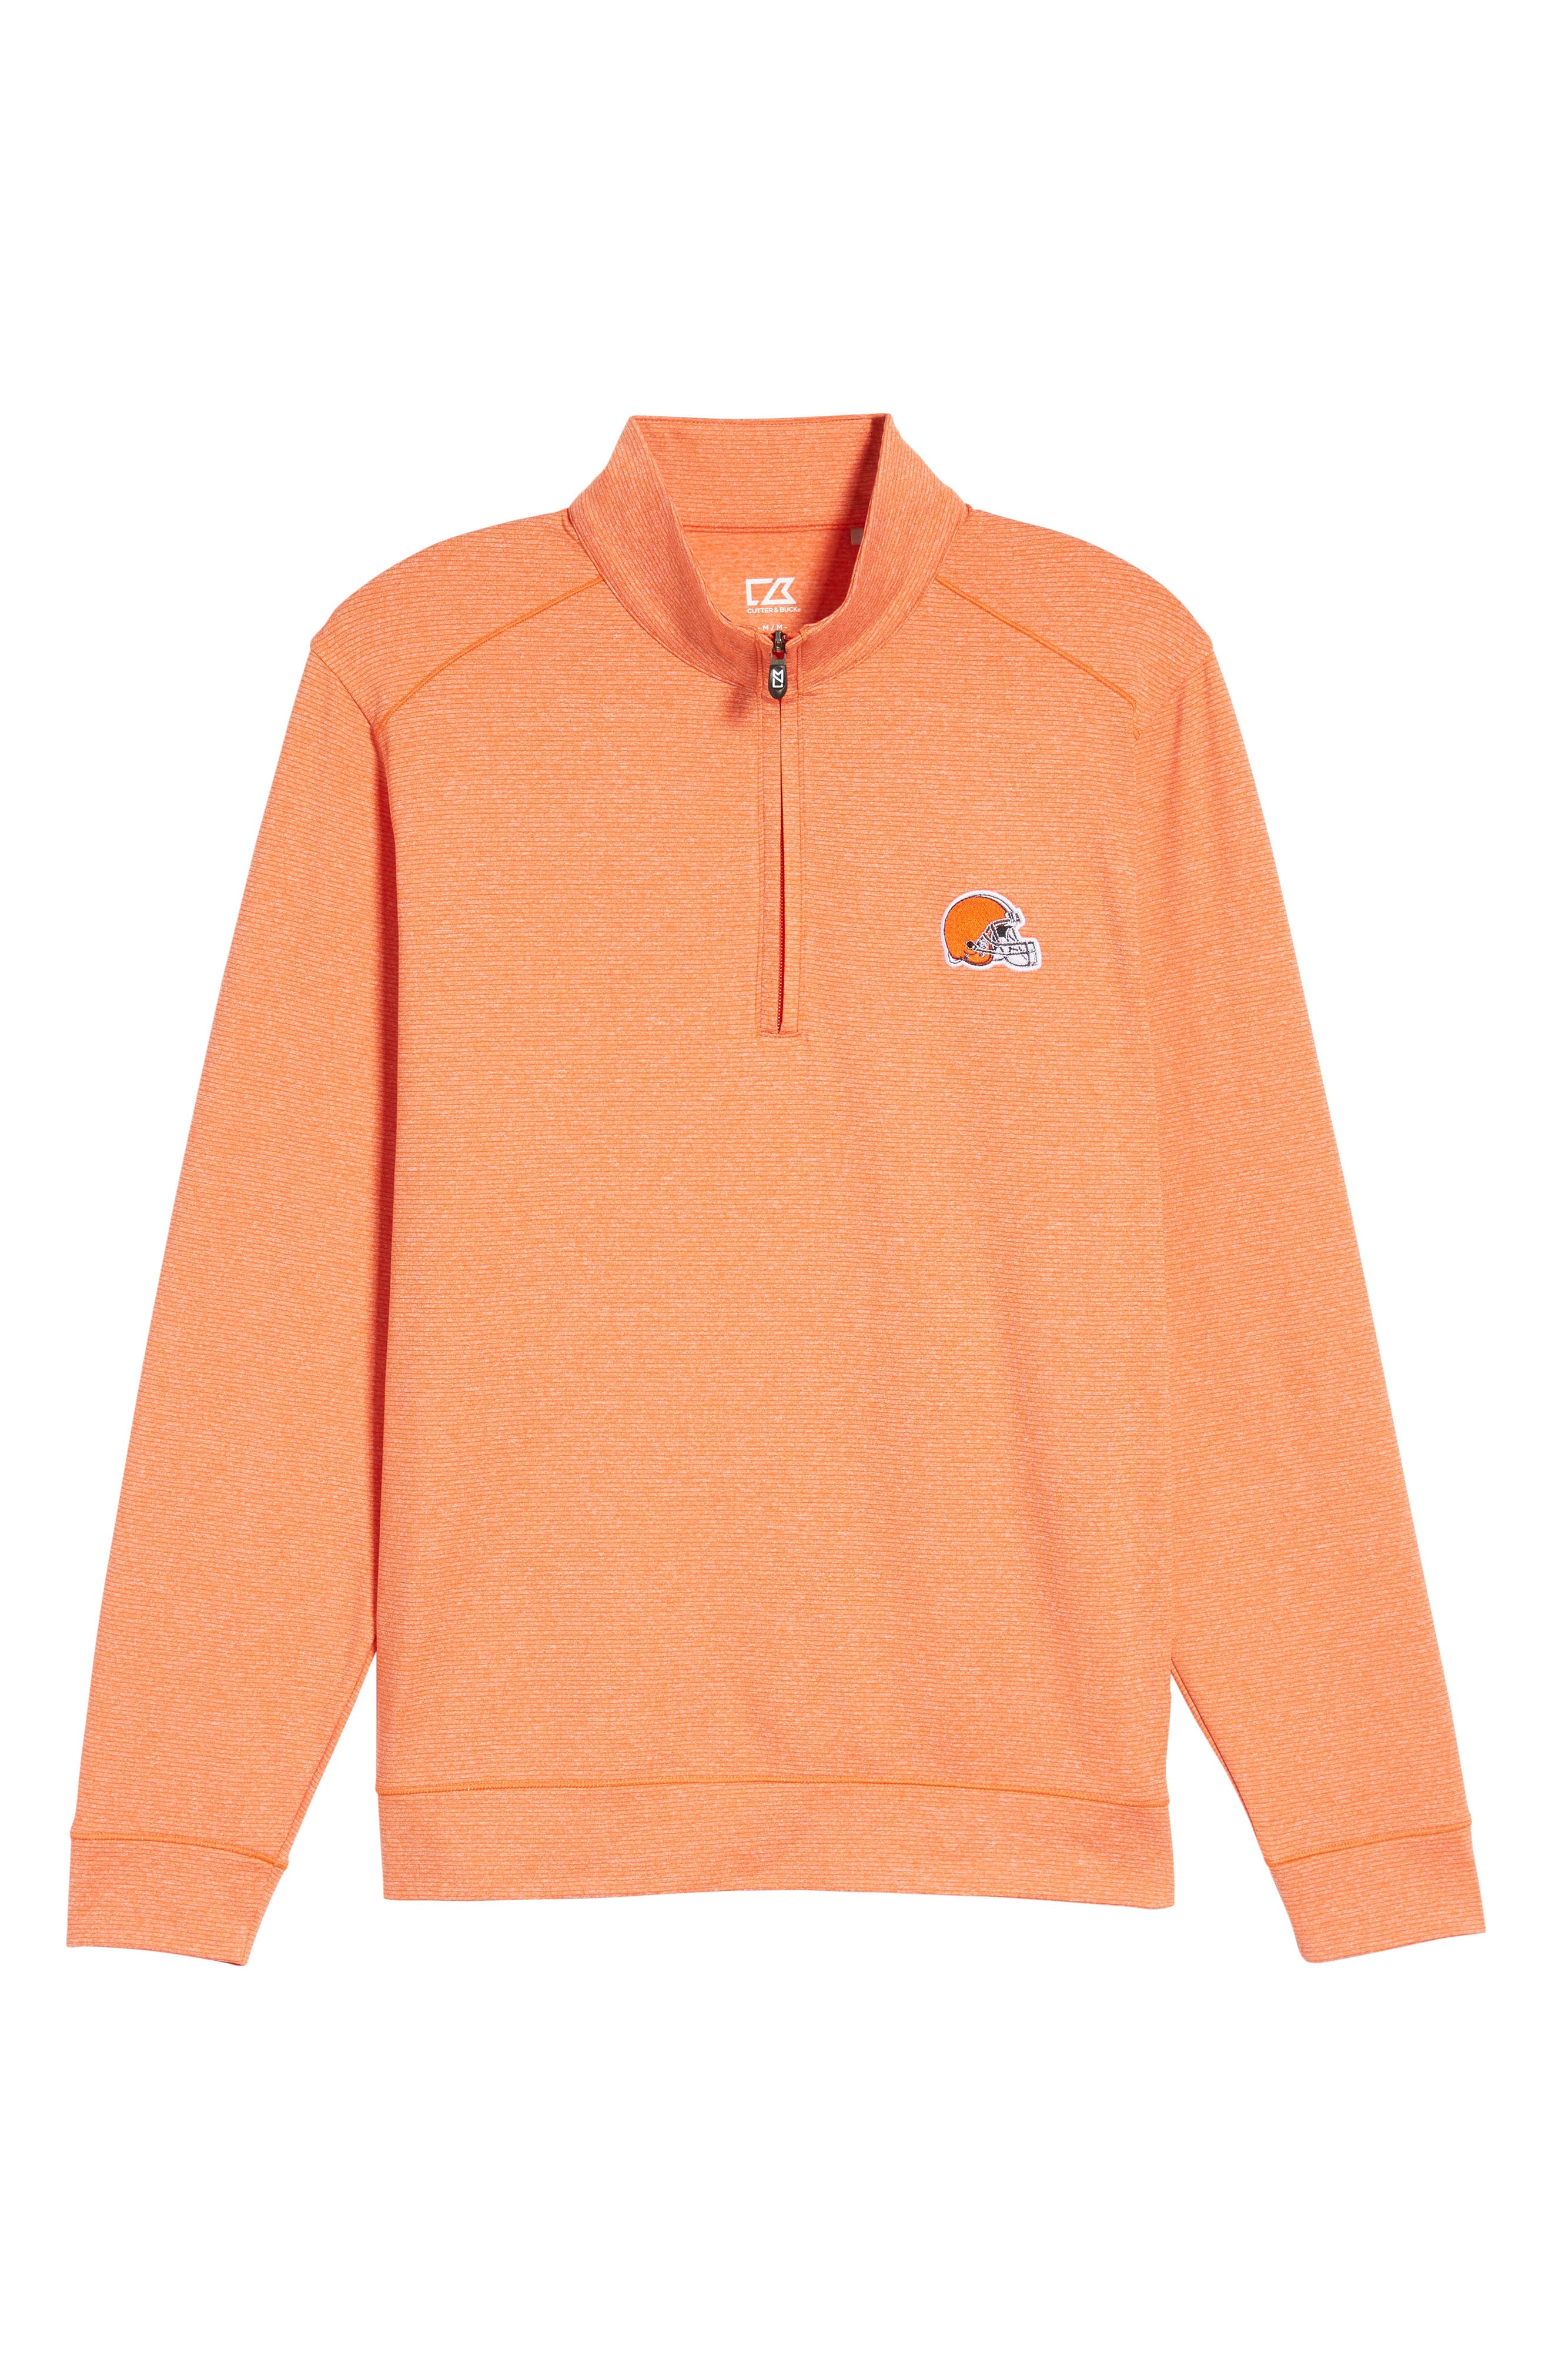 Shoreline - Cleveland Browns Half Zip Pullover,                             Alternate thumbnail 5, color,                             College Orange Heather